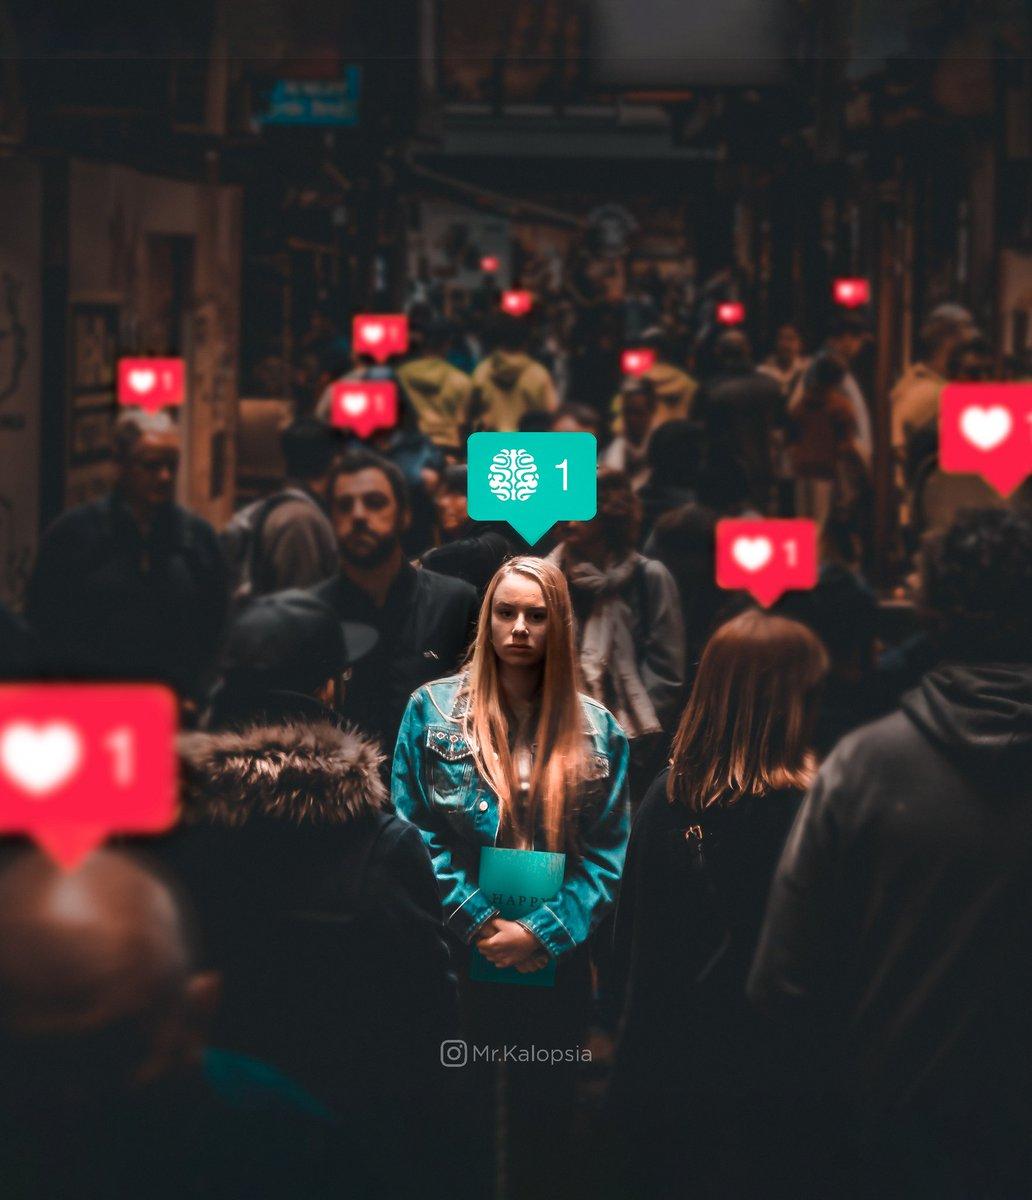 Awake in the digital world.. Photo by @mr.kolapsia